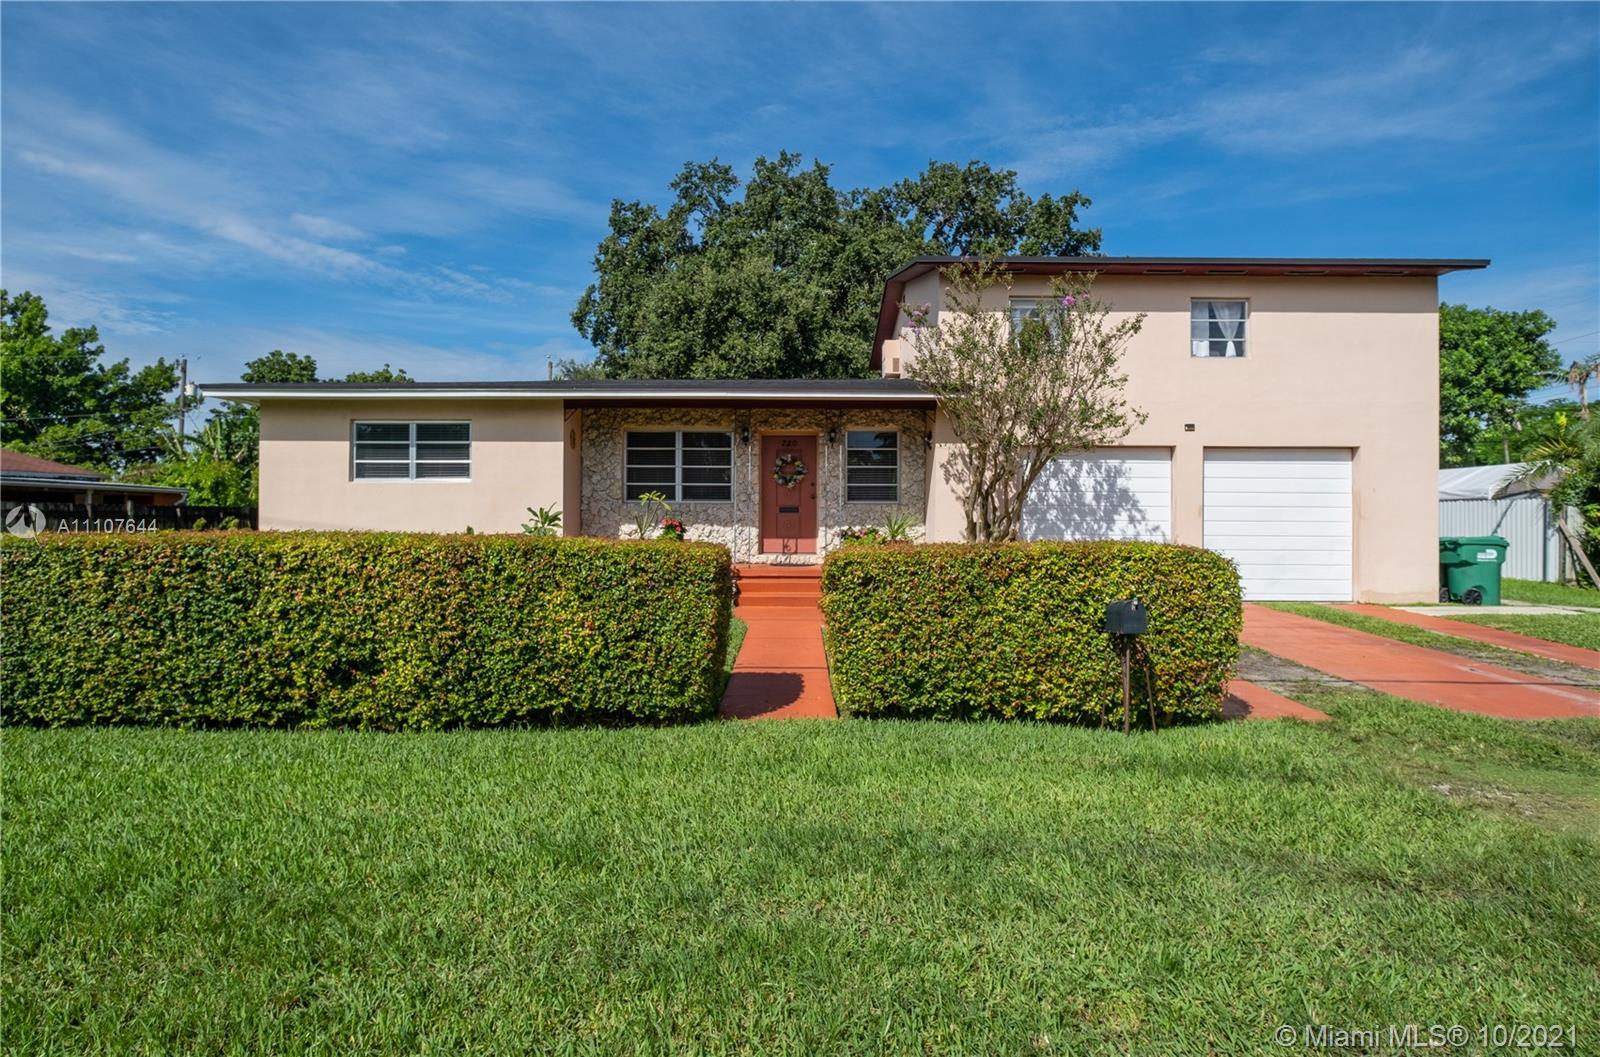 Single Family Home,For Sale,220 SW 78 PL, Miami, Florida 33144,Brickell,realty,broker,condos near me